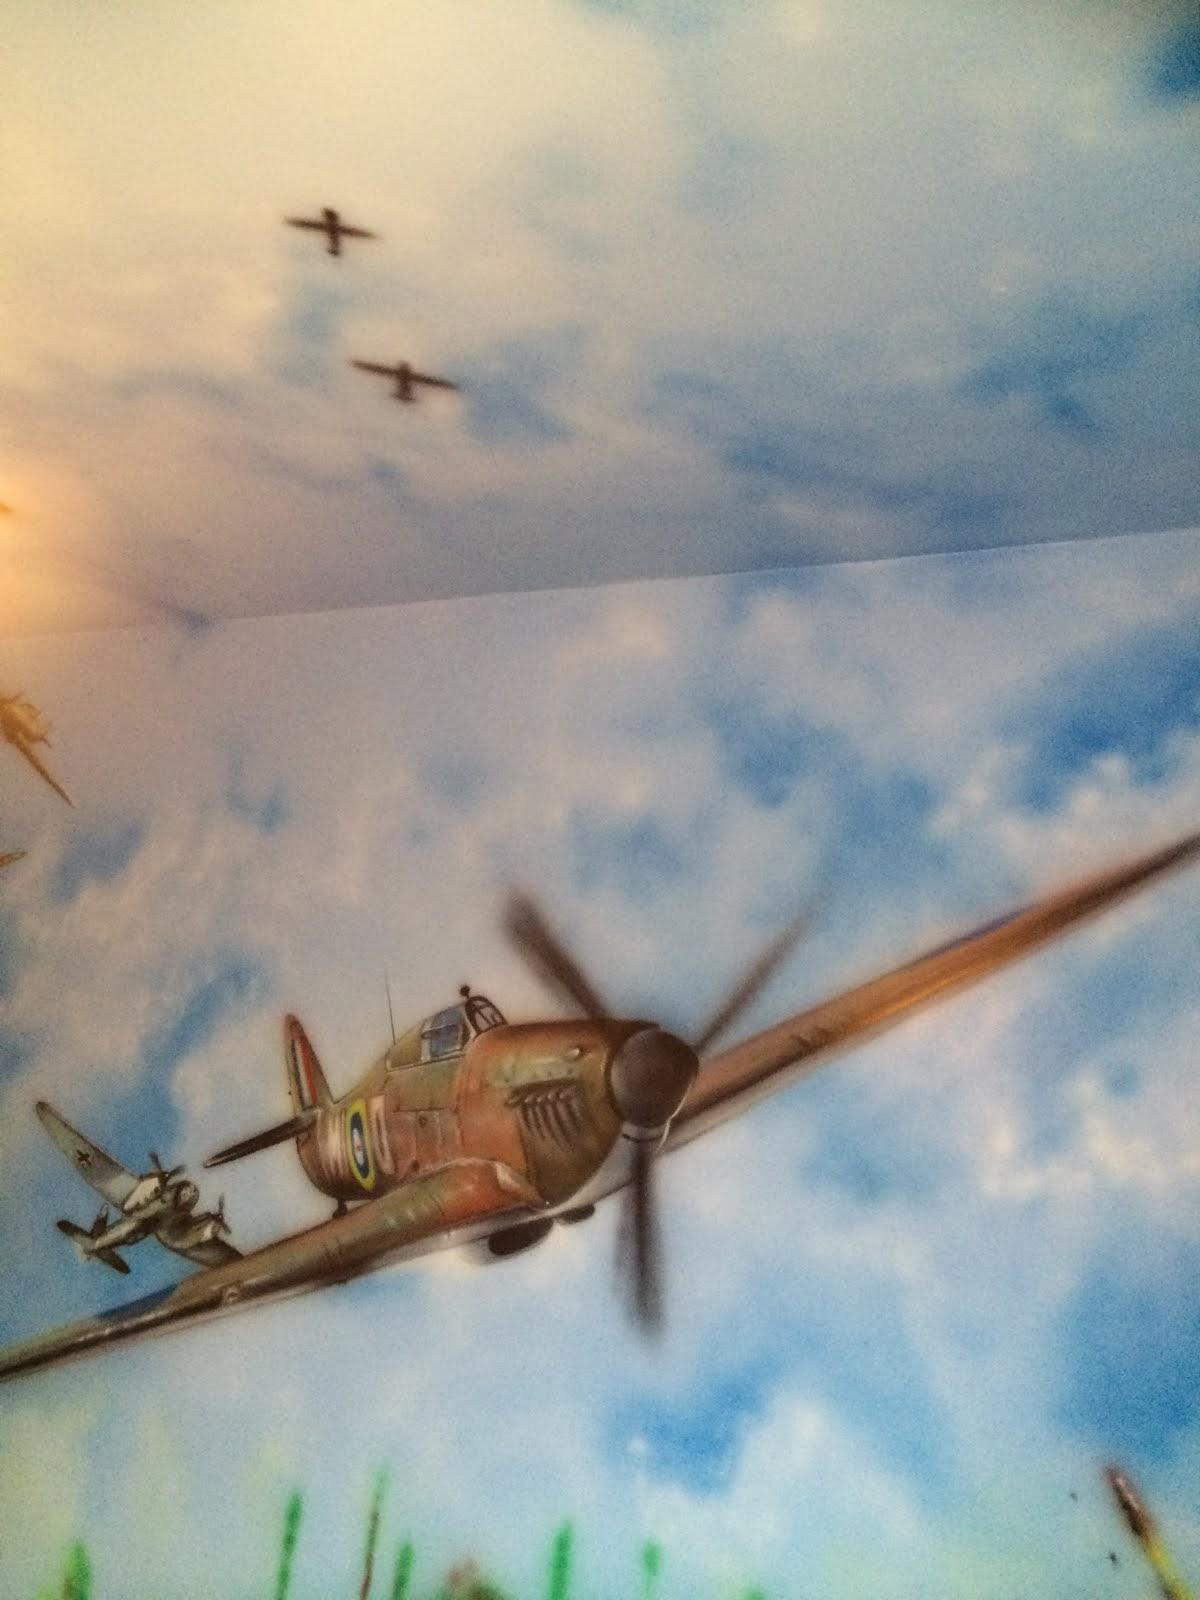 east coast airbrush spitfire wall mural spitfire wall mural